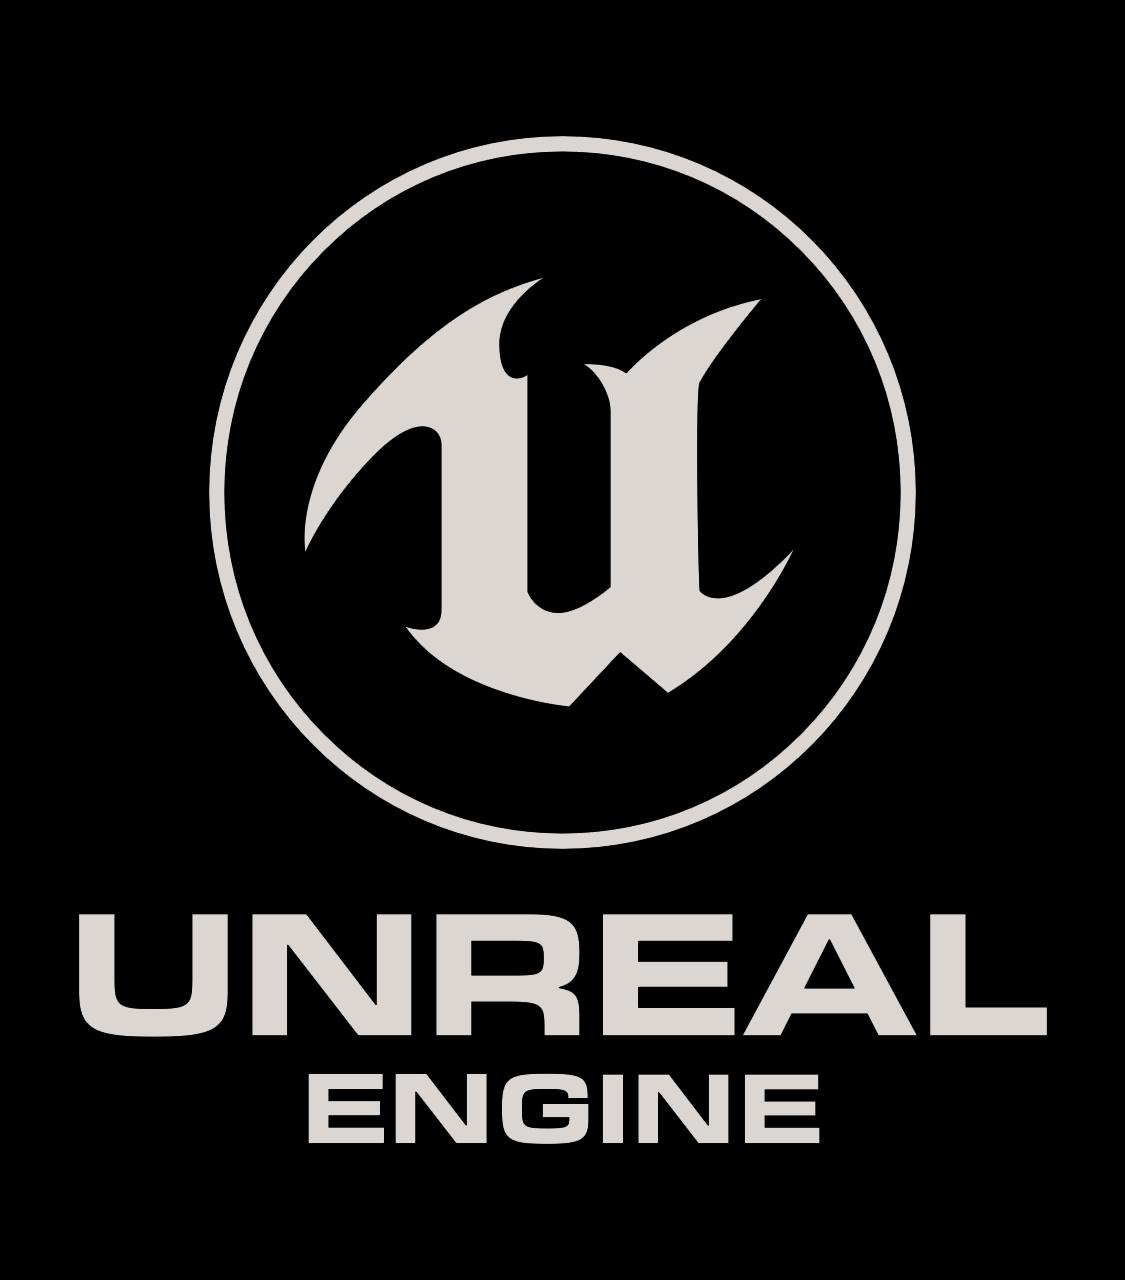 Unreal Engine Unreal Engine Engineering Logo Design